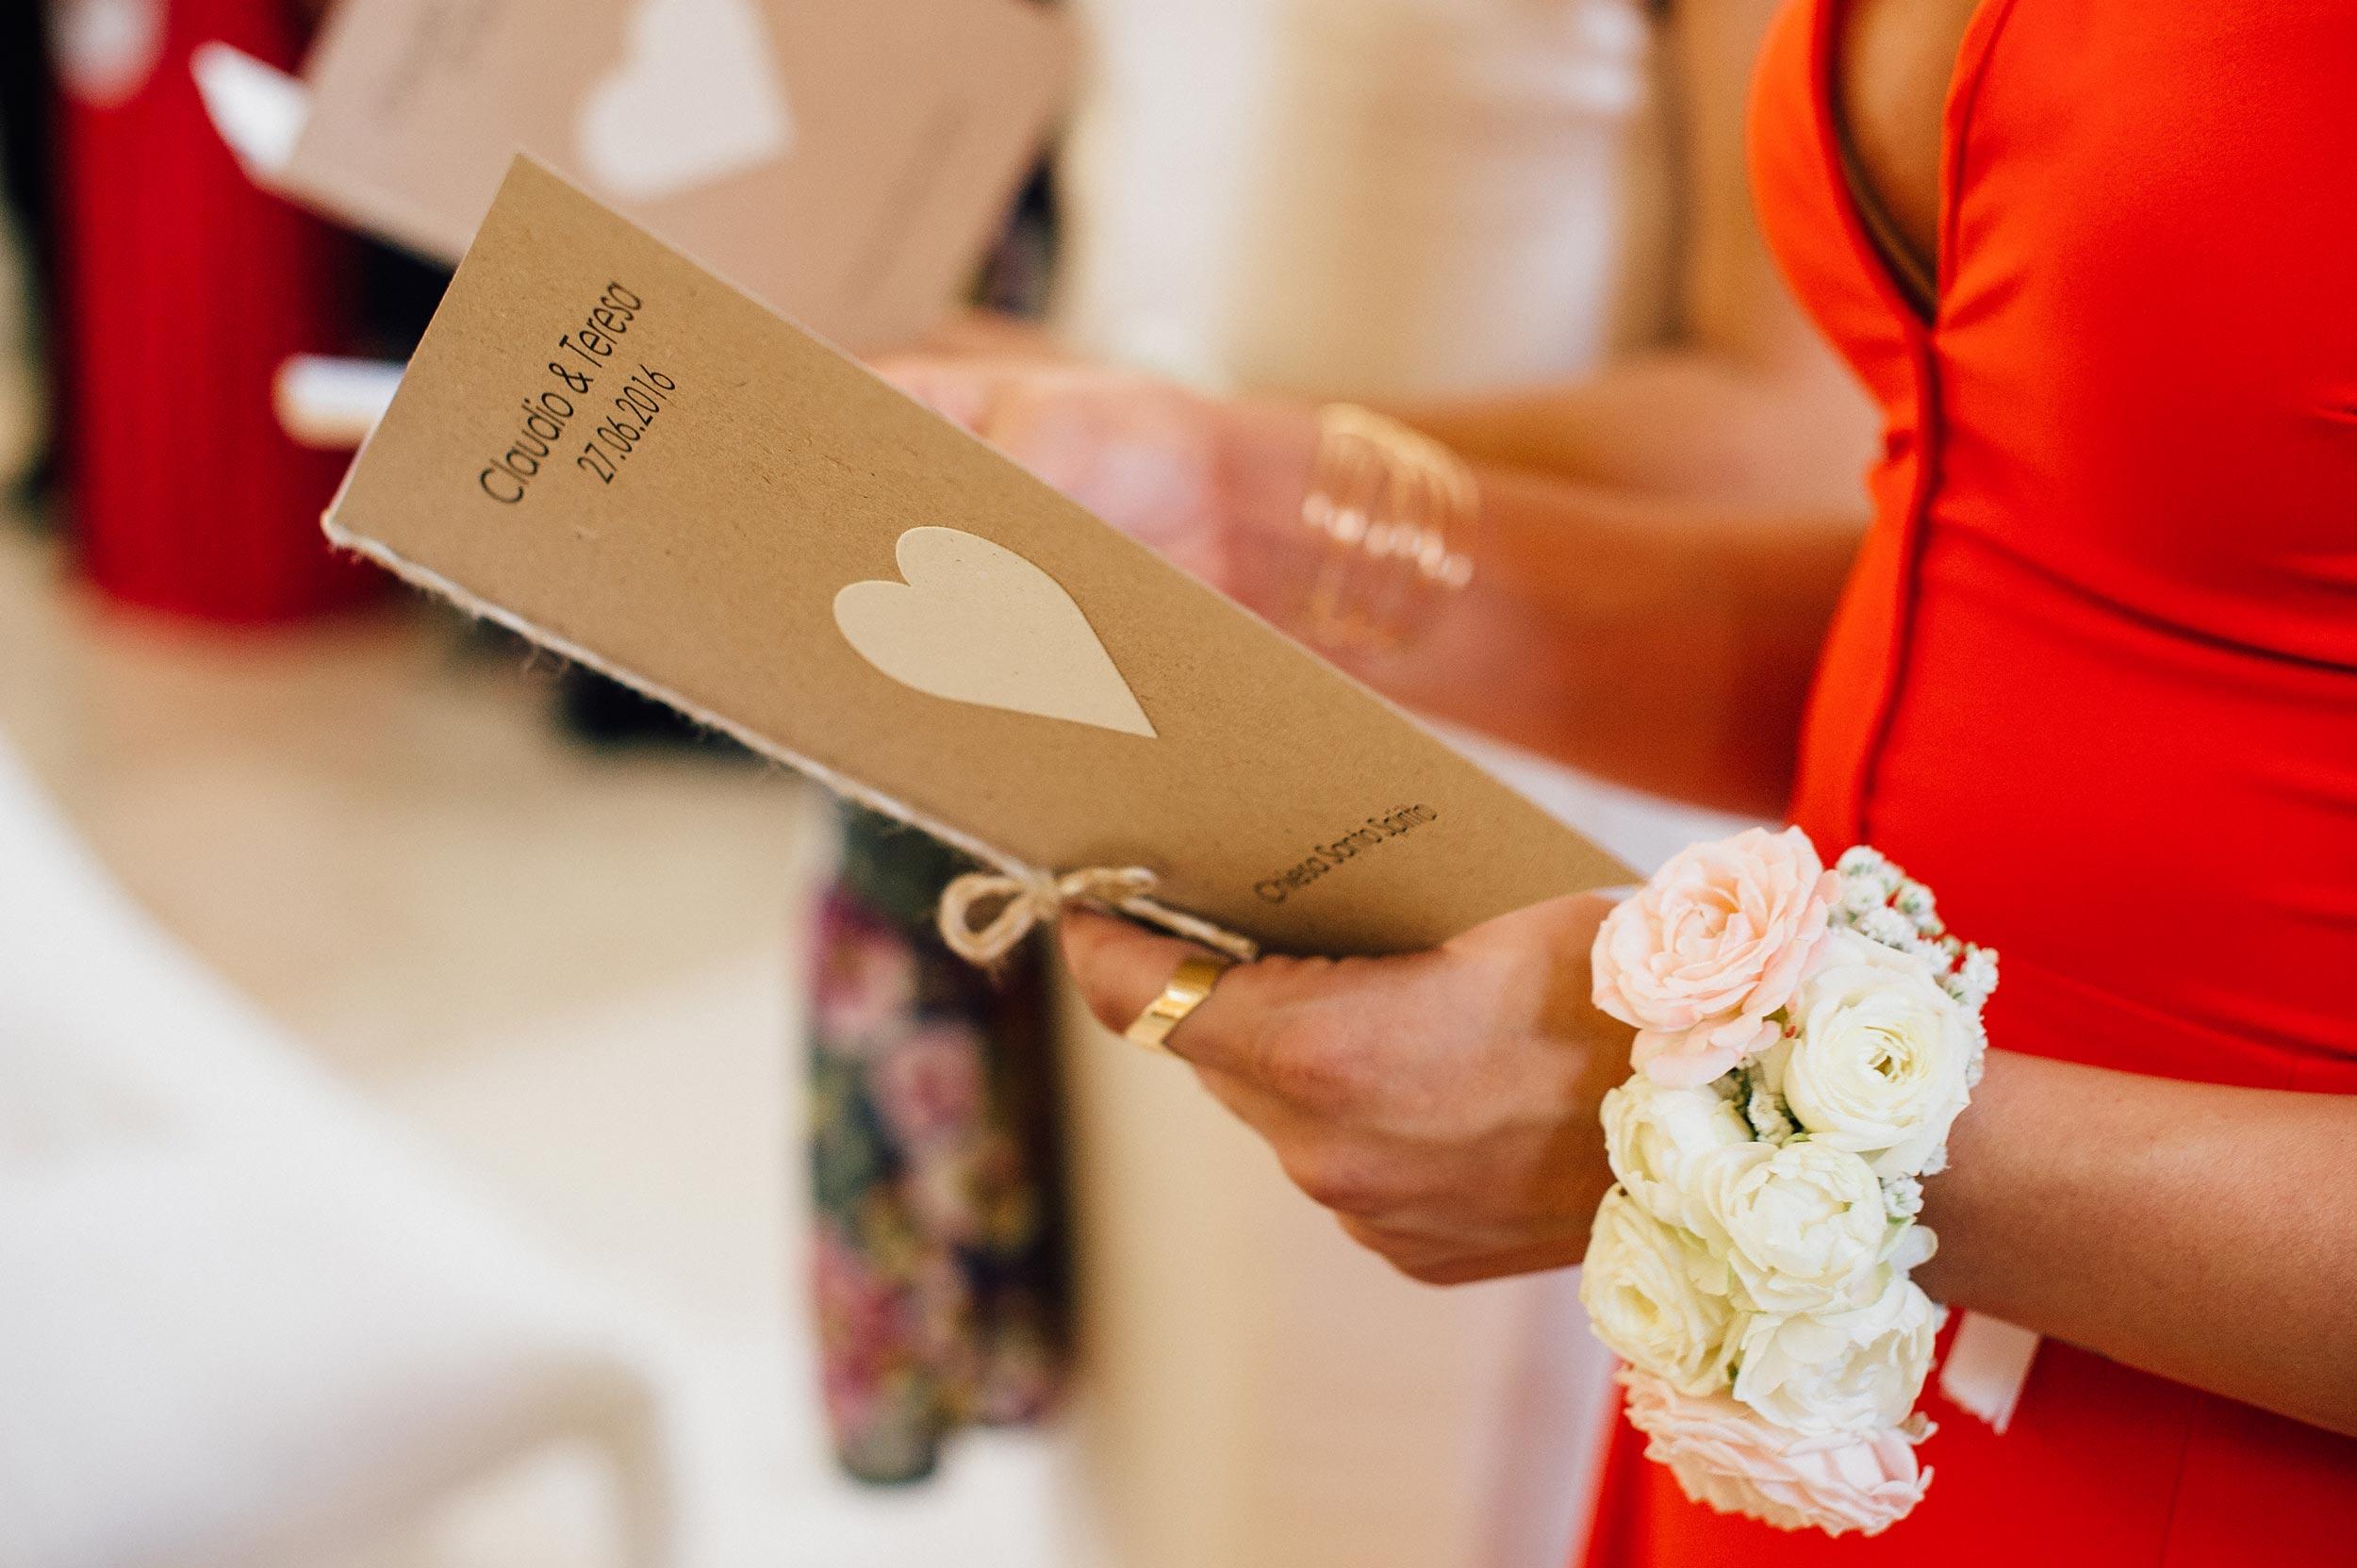 2016-Claudio-Teresa-Naples-Wedding-Photographer-Italy-Alessandro-Avenali-43.jpg